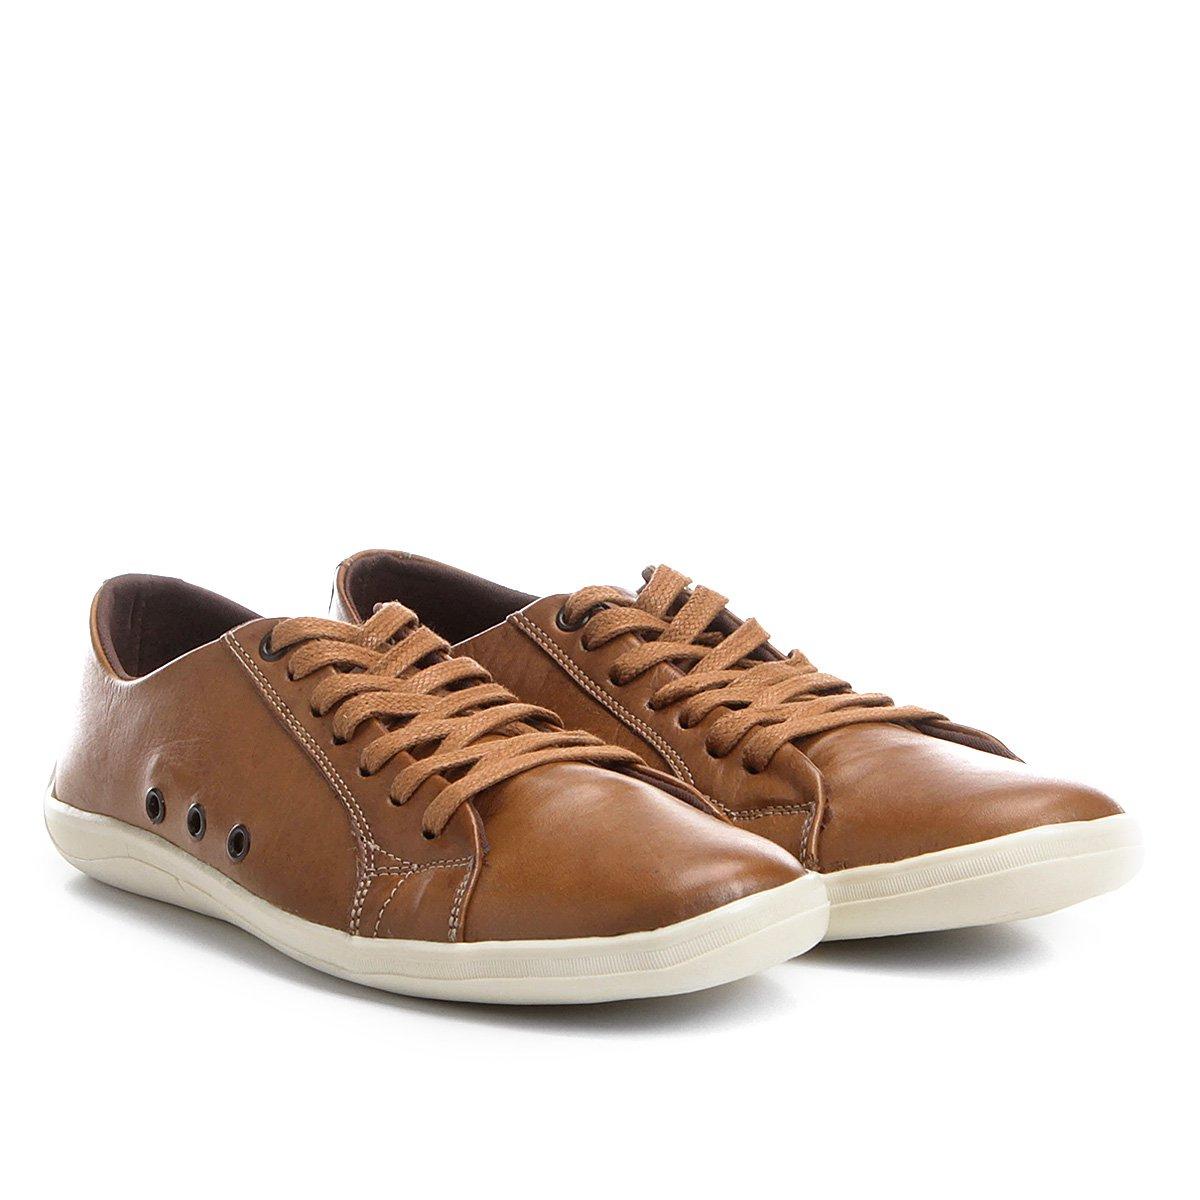 Sapatênis Sapatênis Masculino II Shoestock Bege Couro Shoestock II Couro Masculino rWInprq